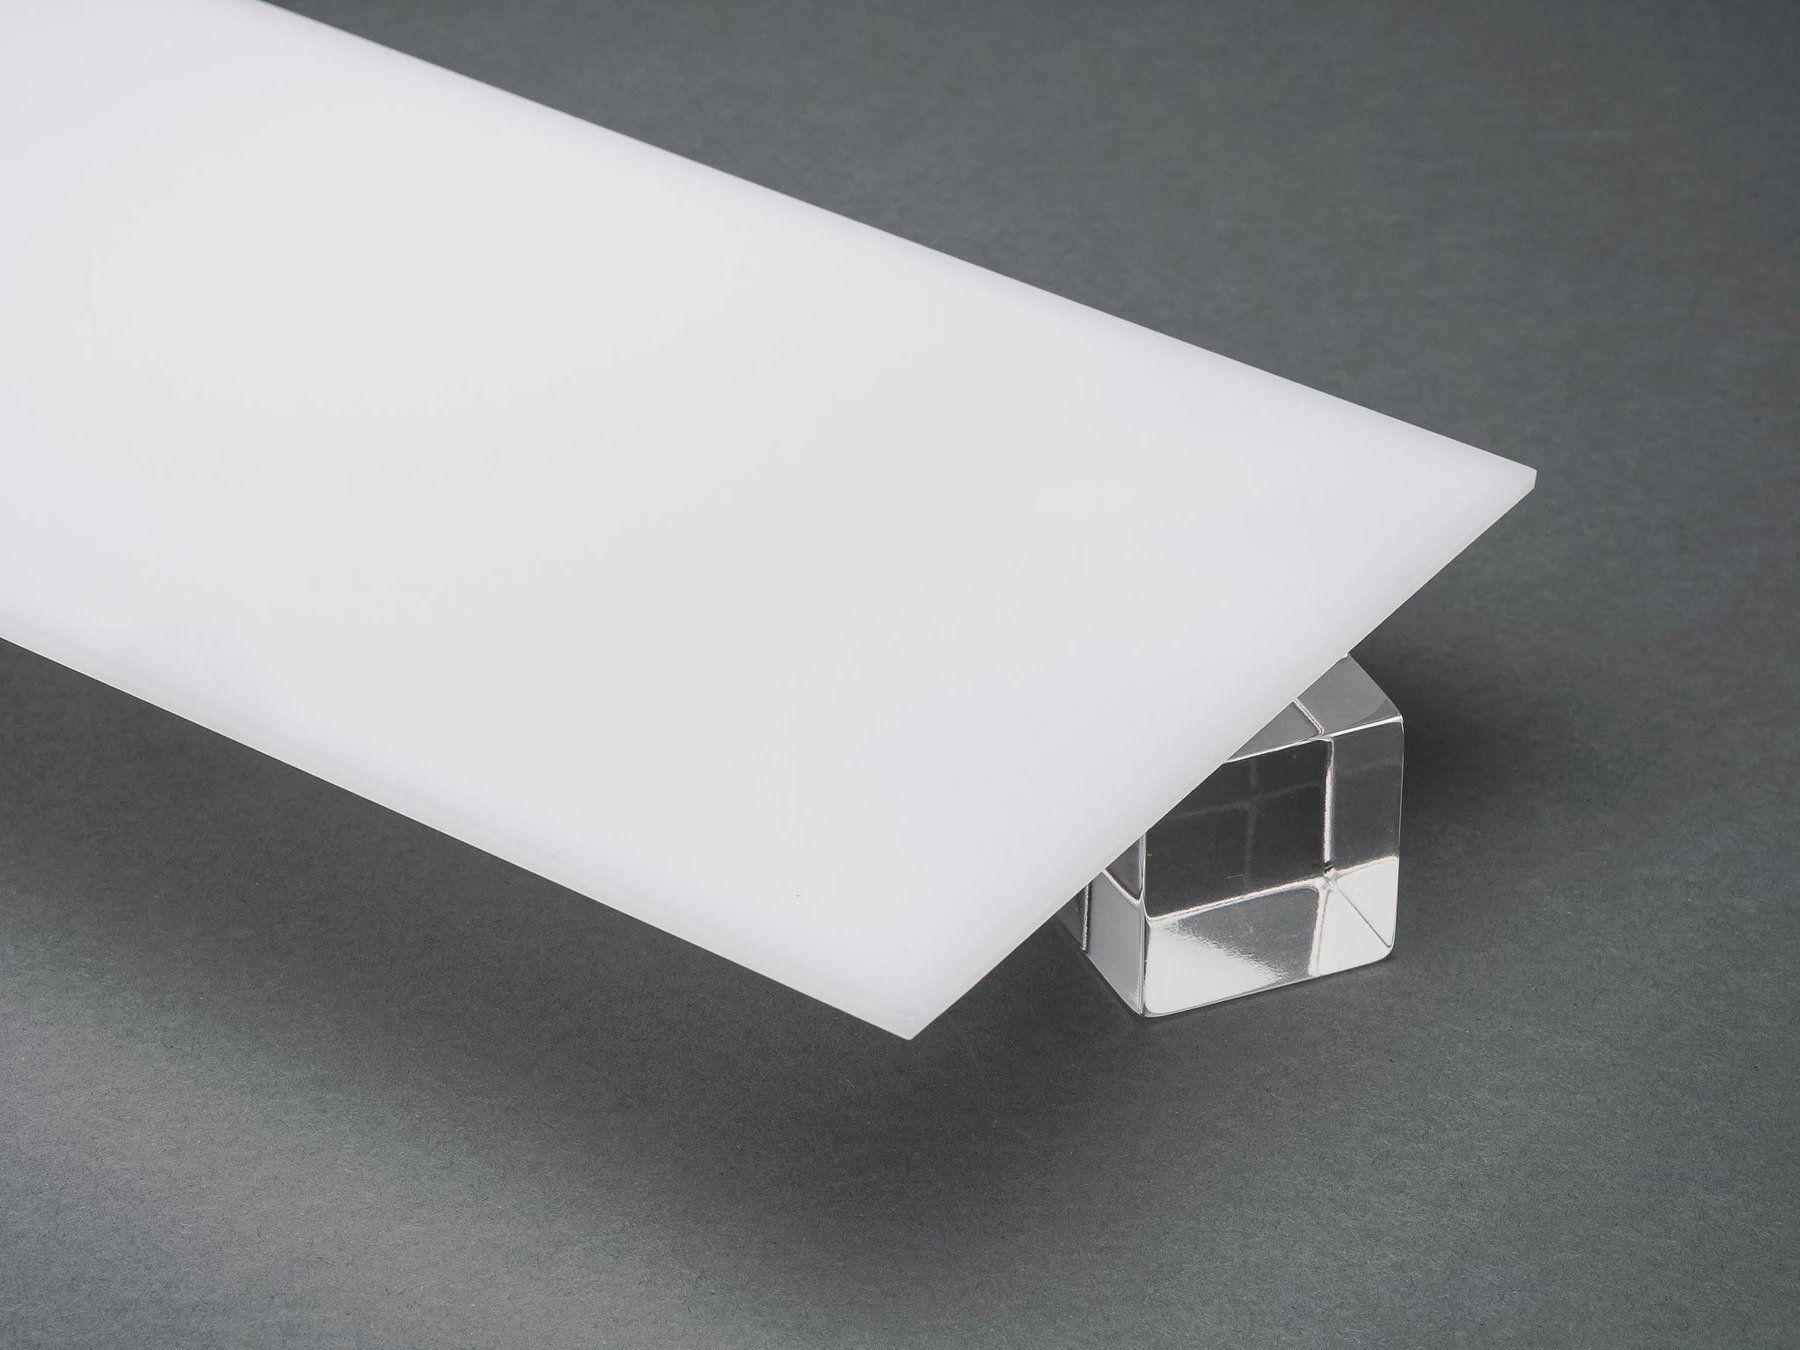 Acrylic Sheet 1 4 Diffuse White 2447 Plexiglas Plastic Etsy In 2020 Acrylic Sheets White Acrylic Sheet Diffuser